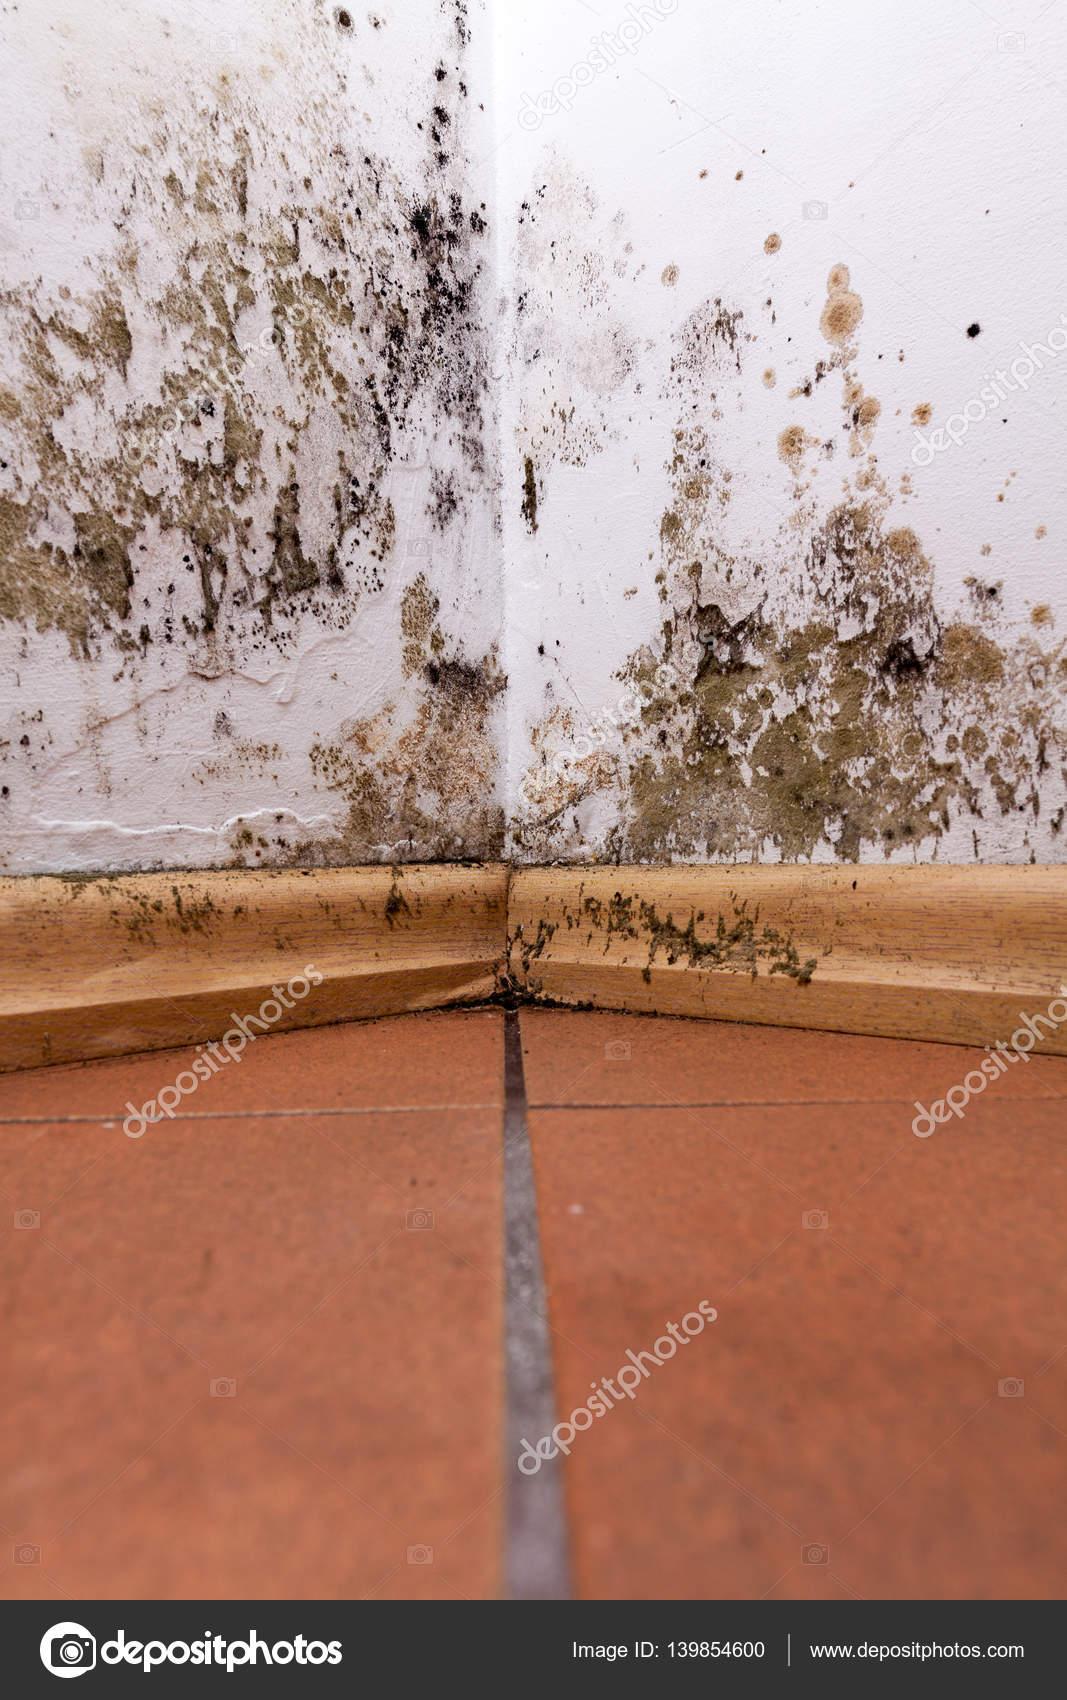 problem mit schimmel im haus — stockfoto © cegli.o2.pl #139854600